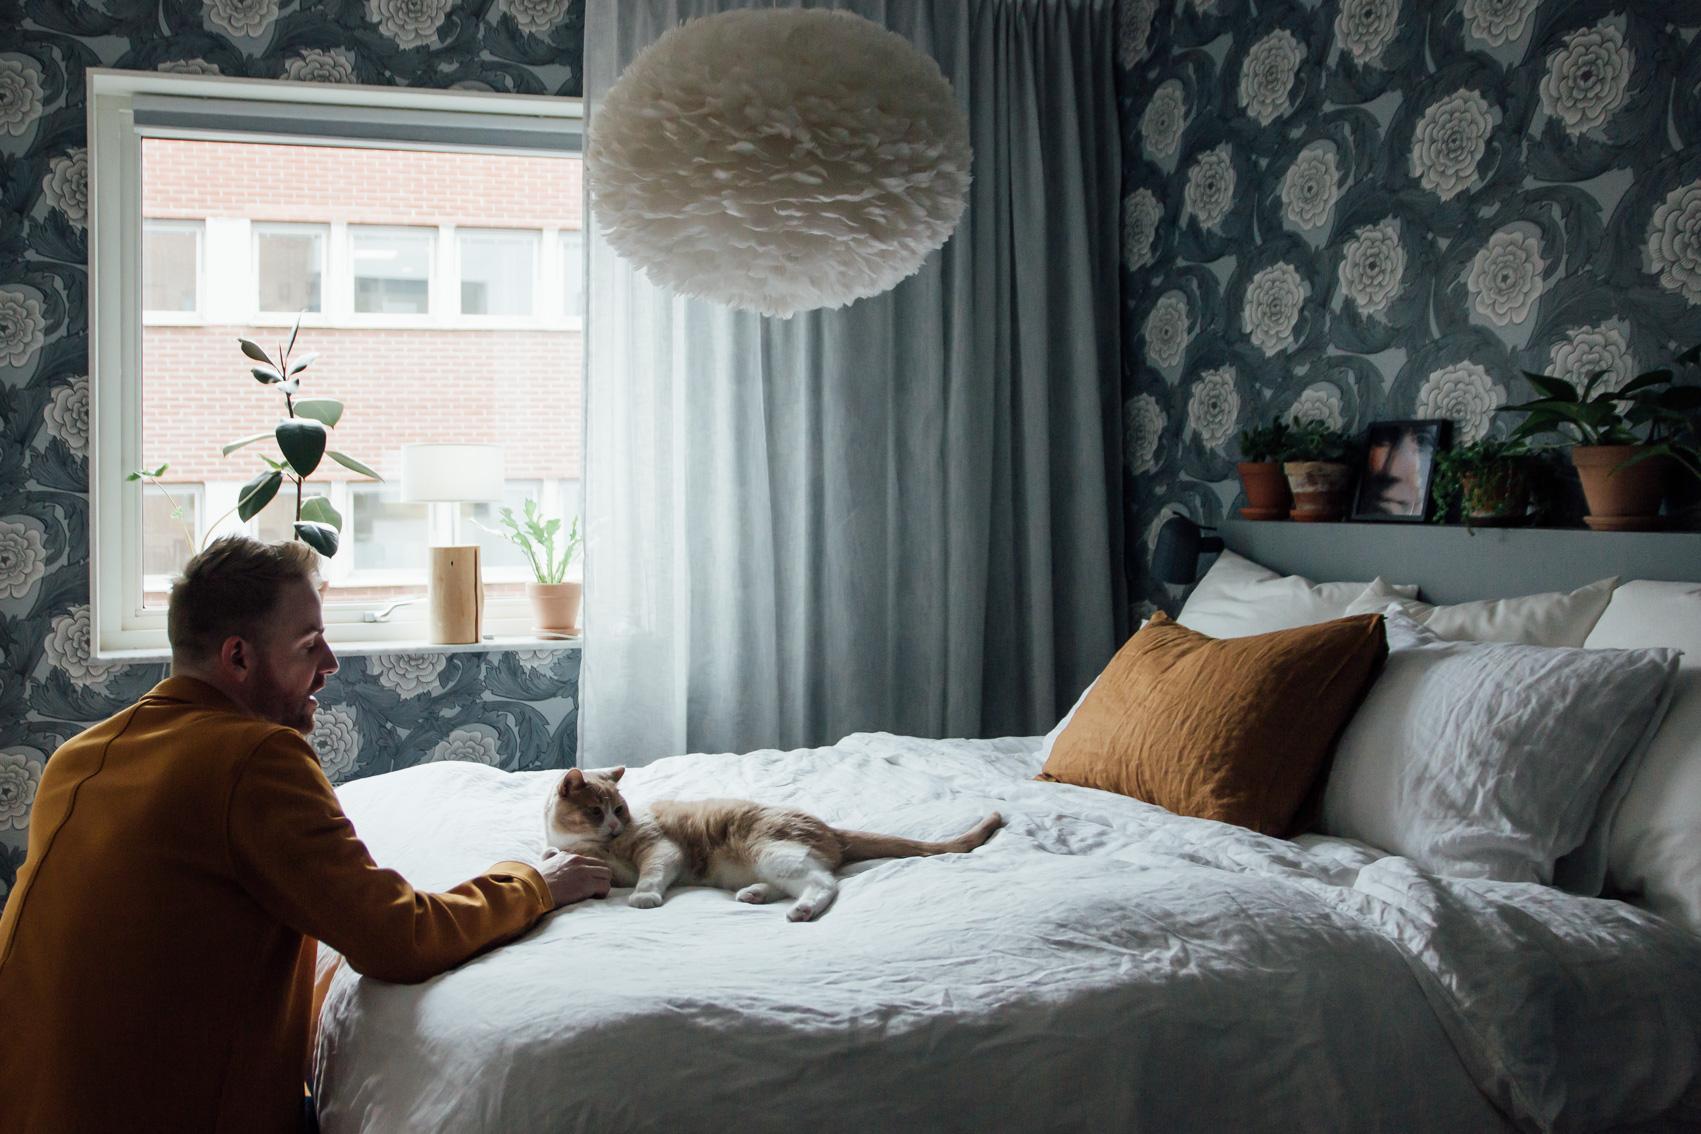 hemma hos trea sovrum midbec tapeter 2